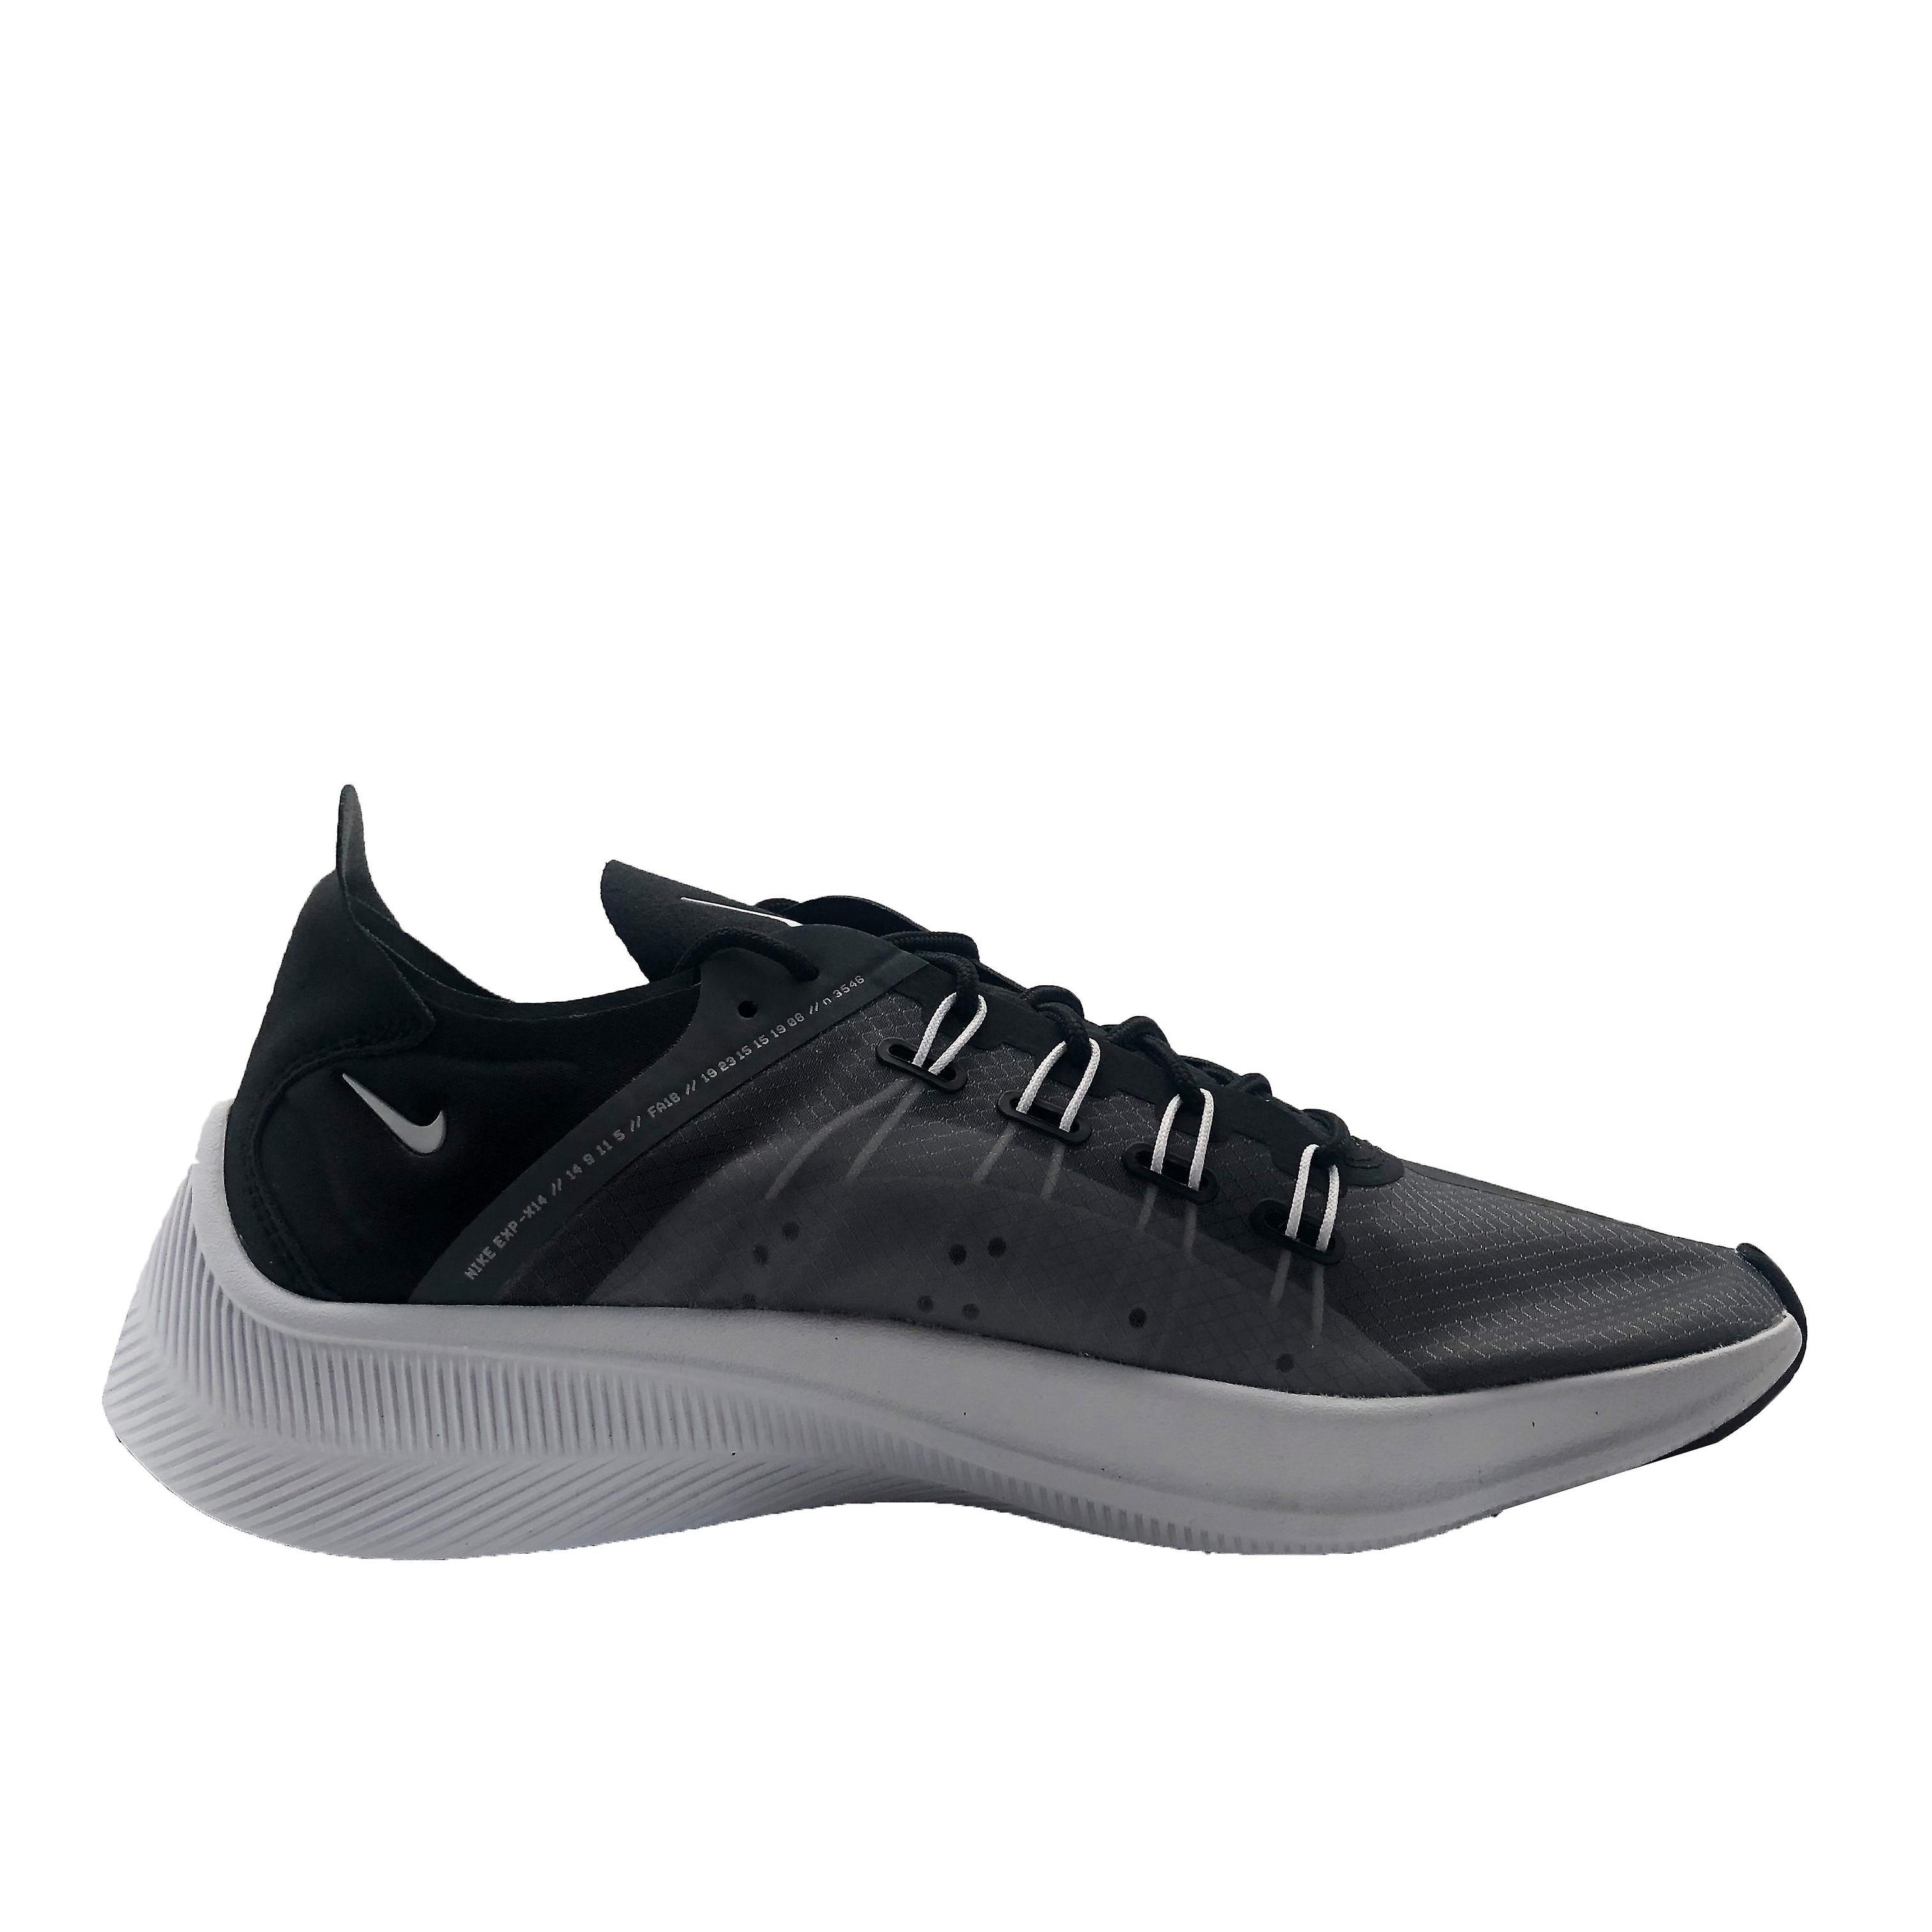 Nike EXP-X14 AO1554 003 Herren Trainer